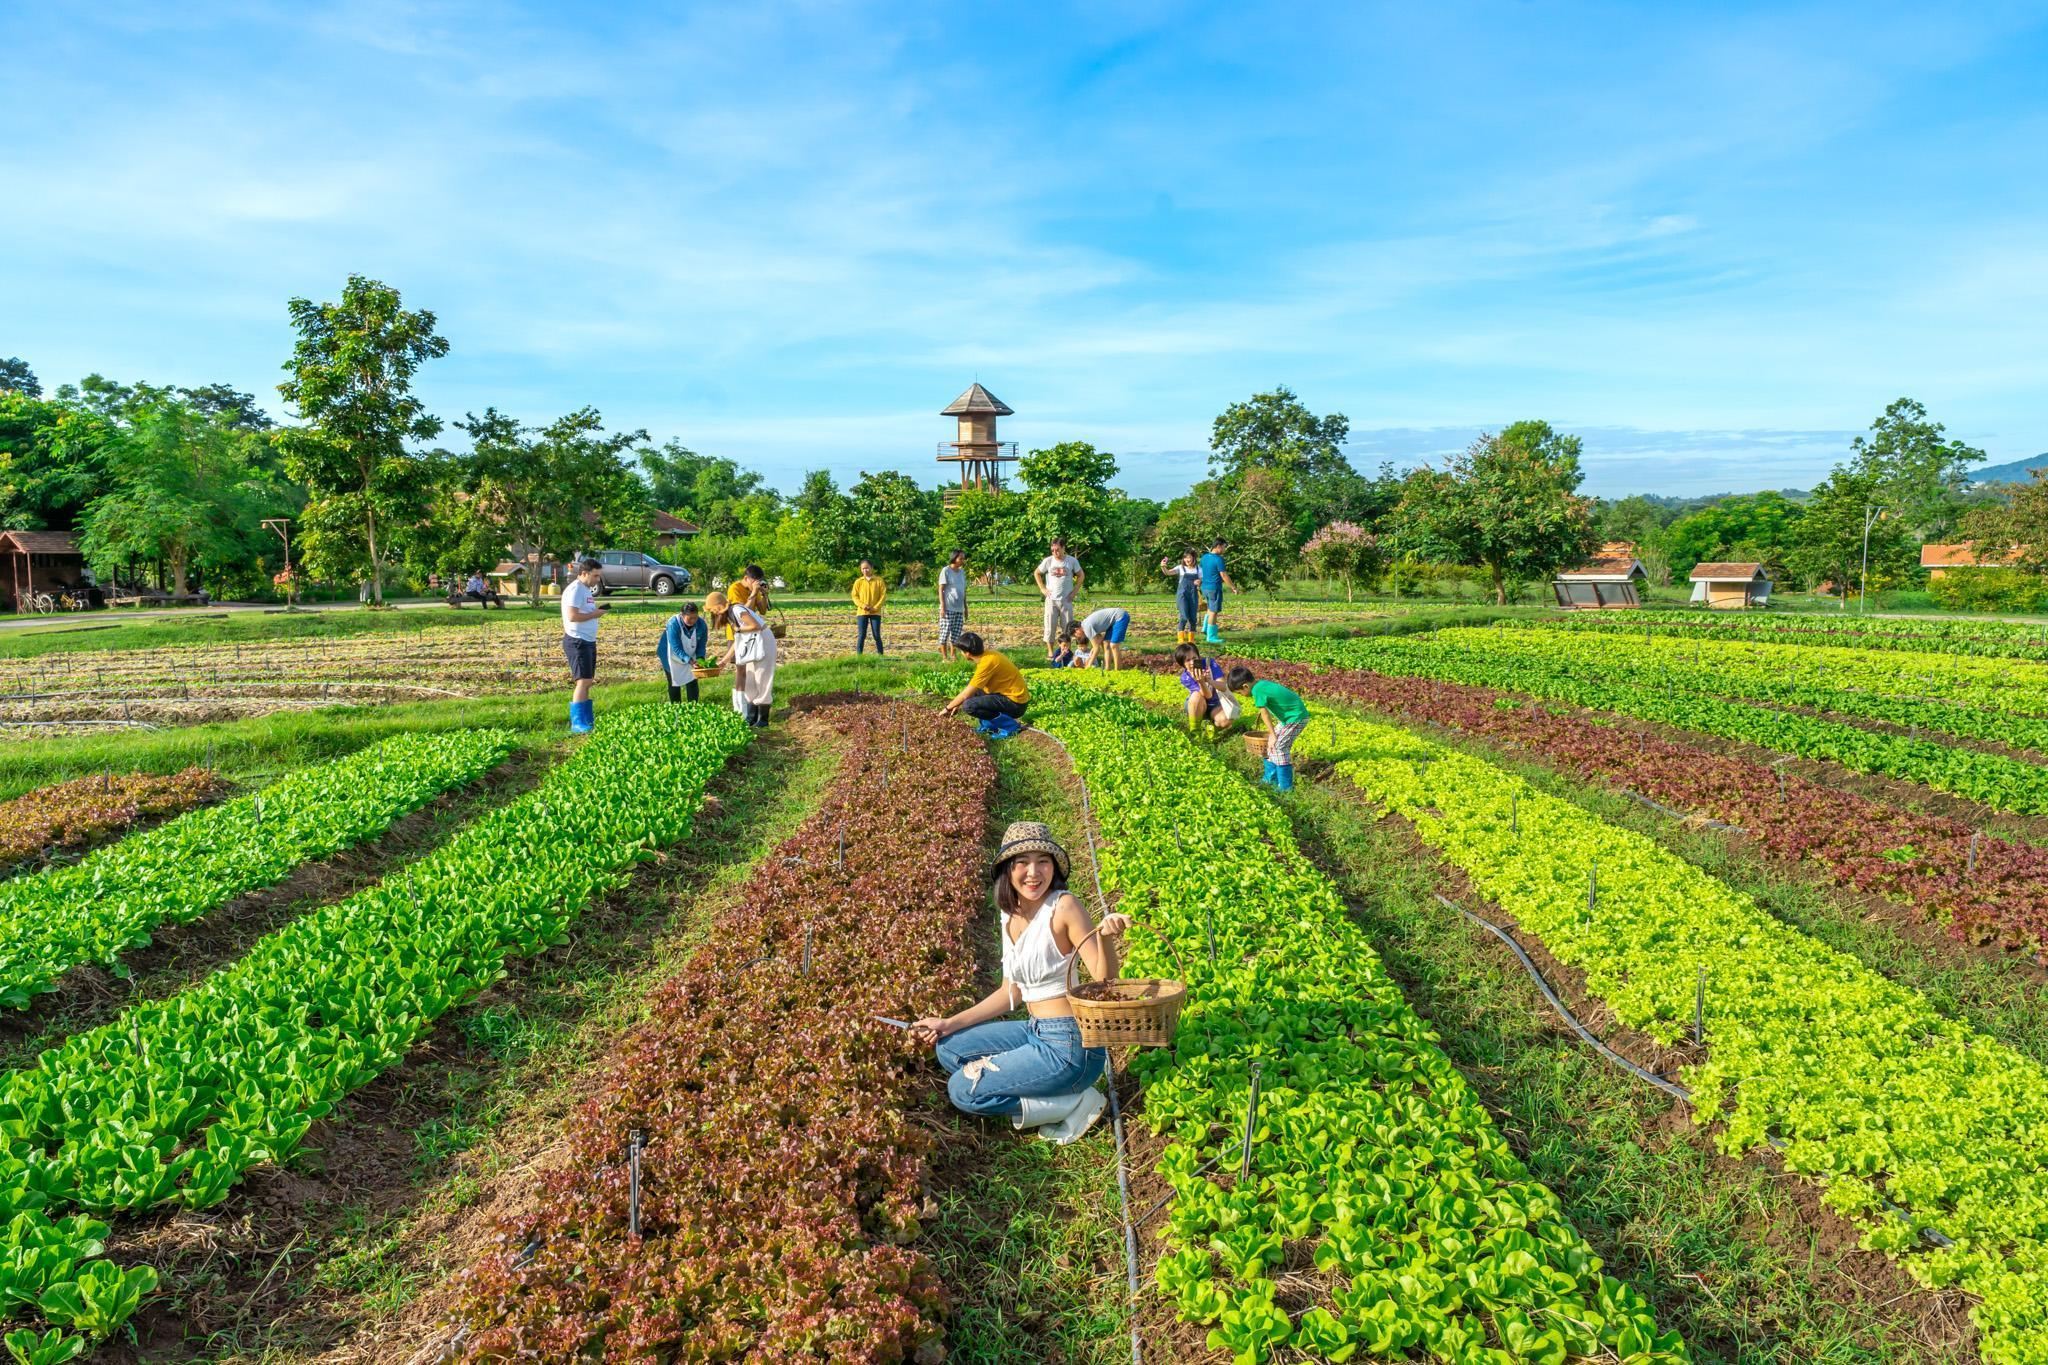 Organic Coolliving Farmhouse